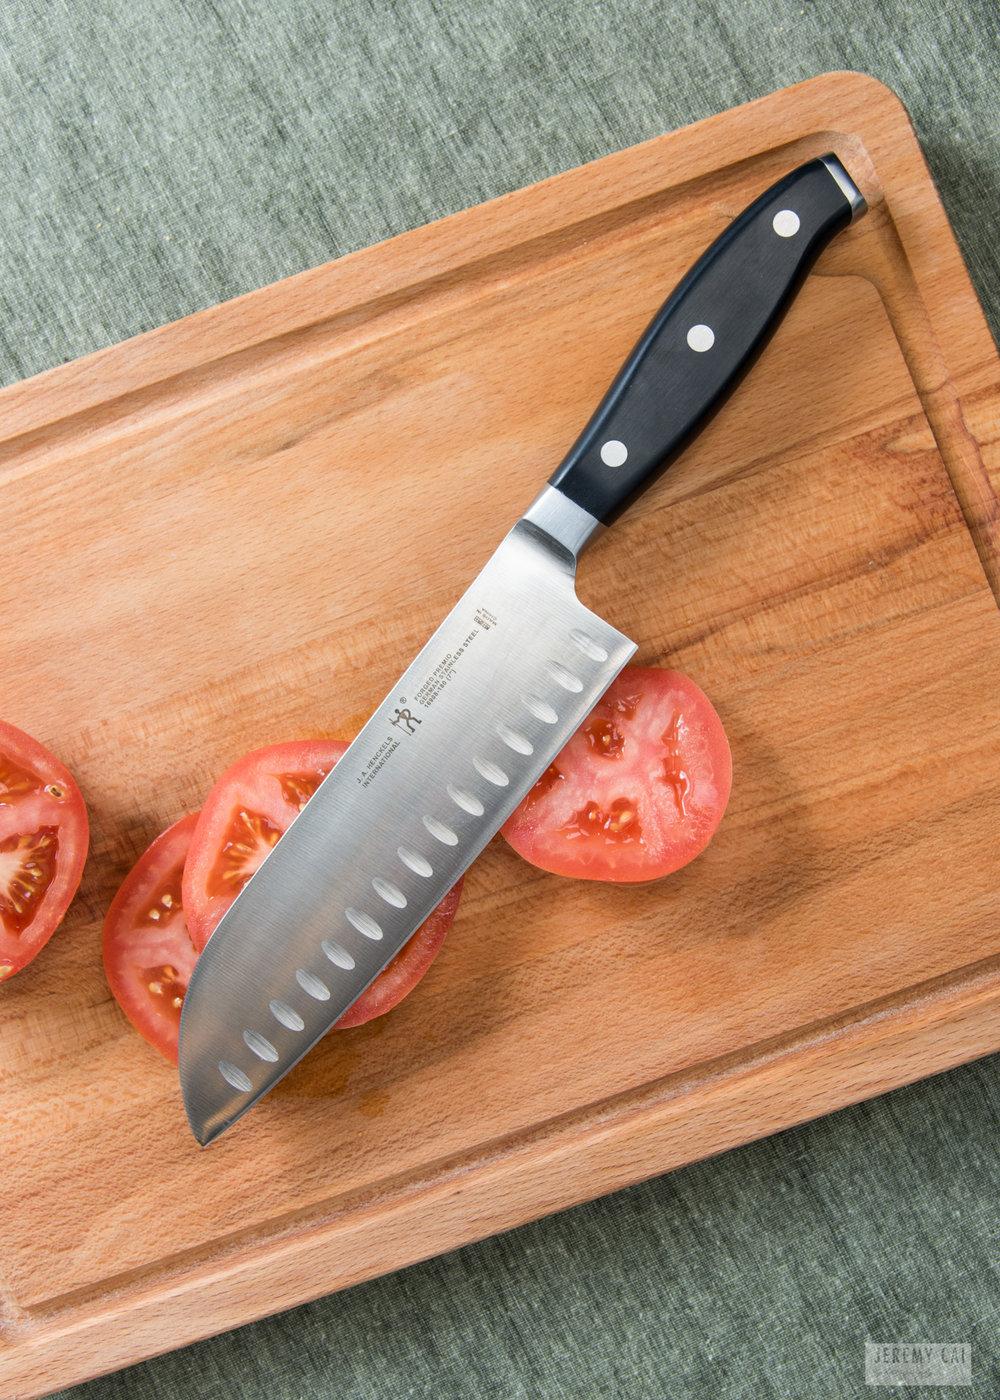 productphotography kitchen knife.jpg